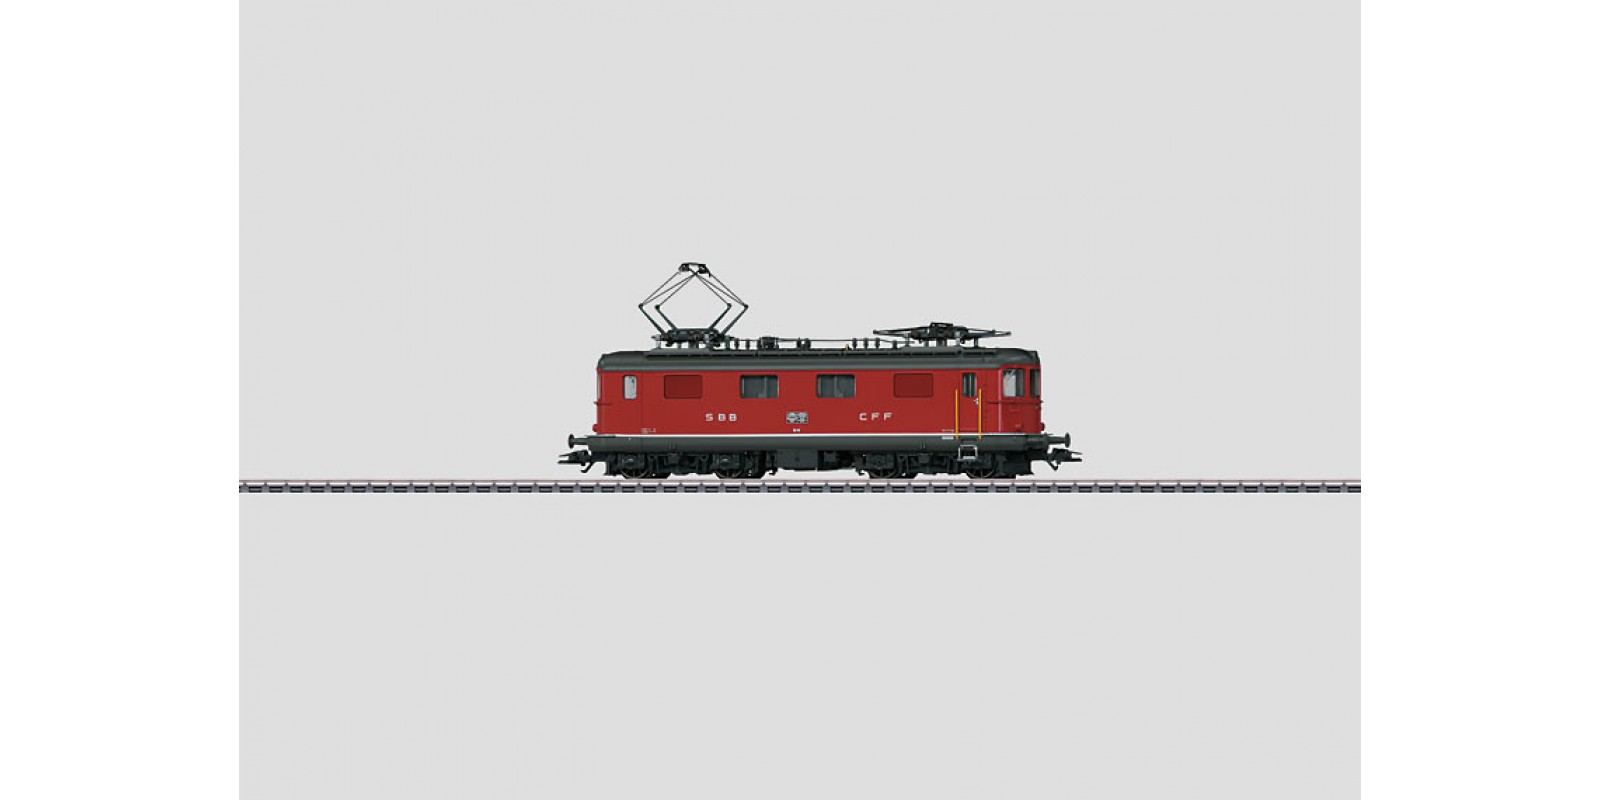 37045 Re 4/4 I, SBB Electric Locomotive